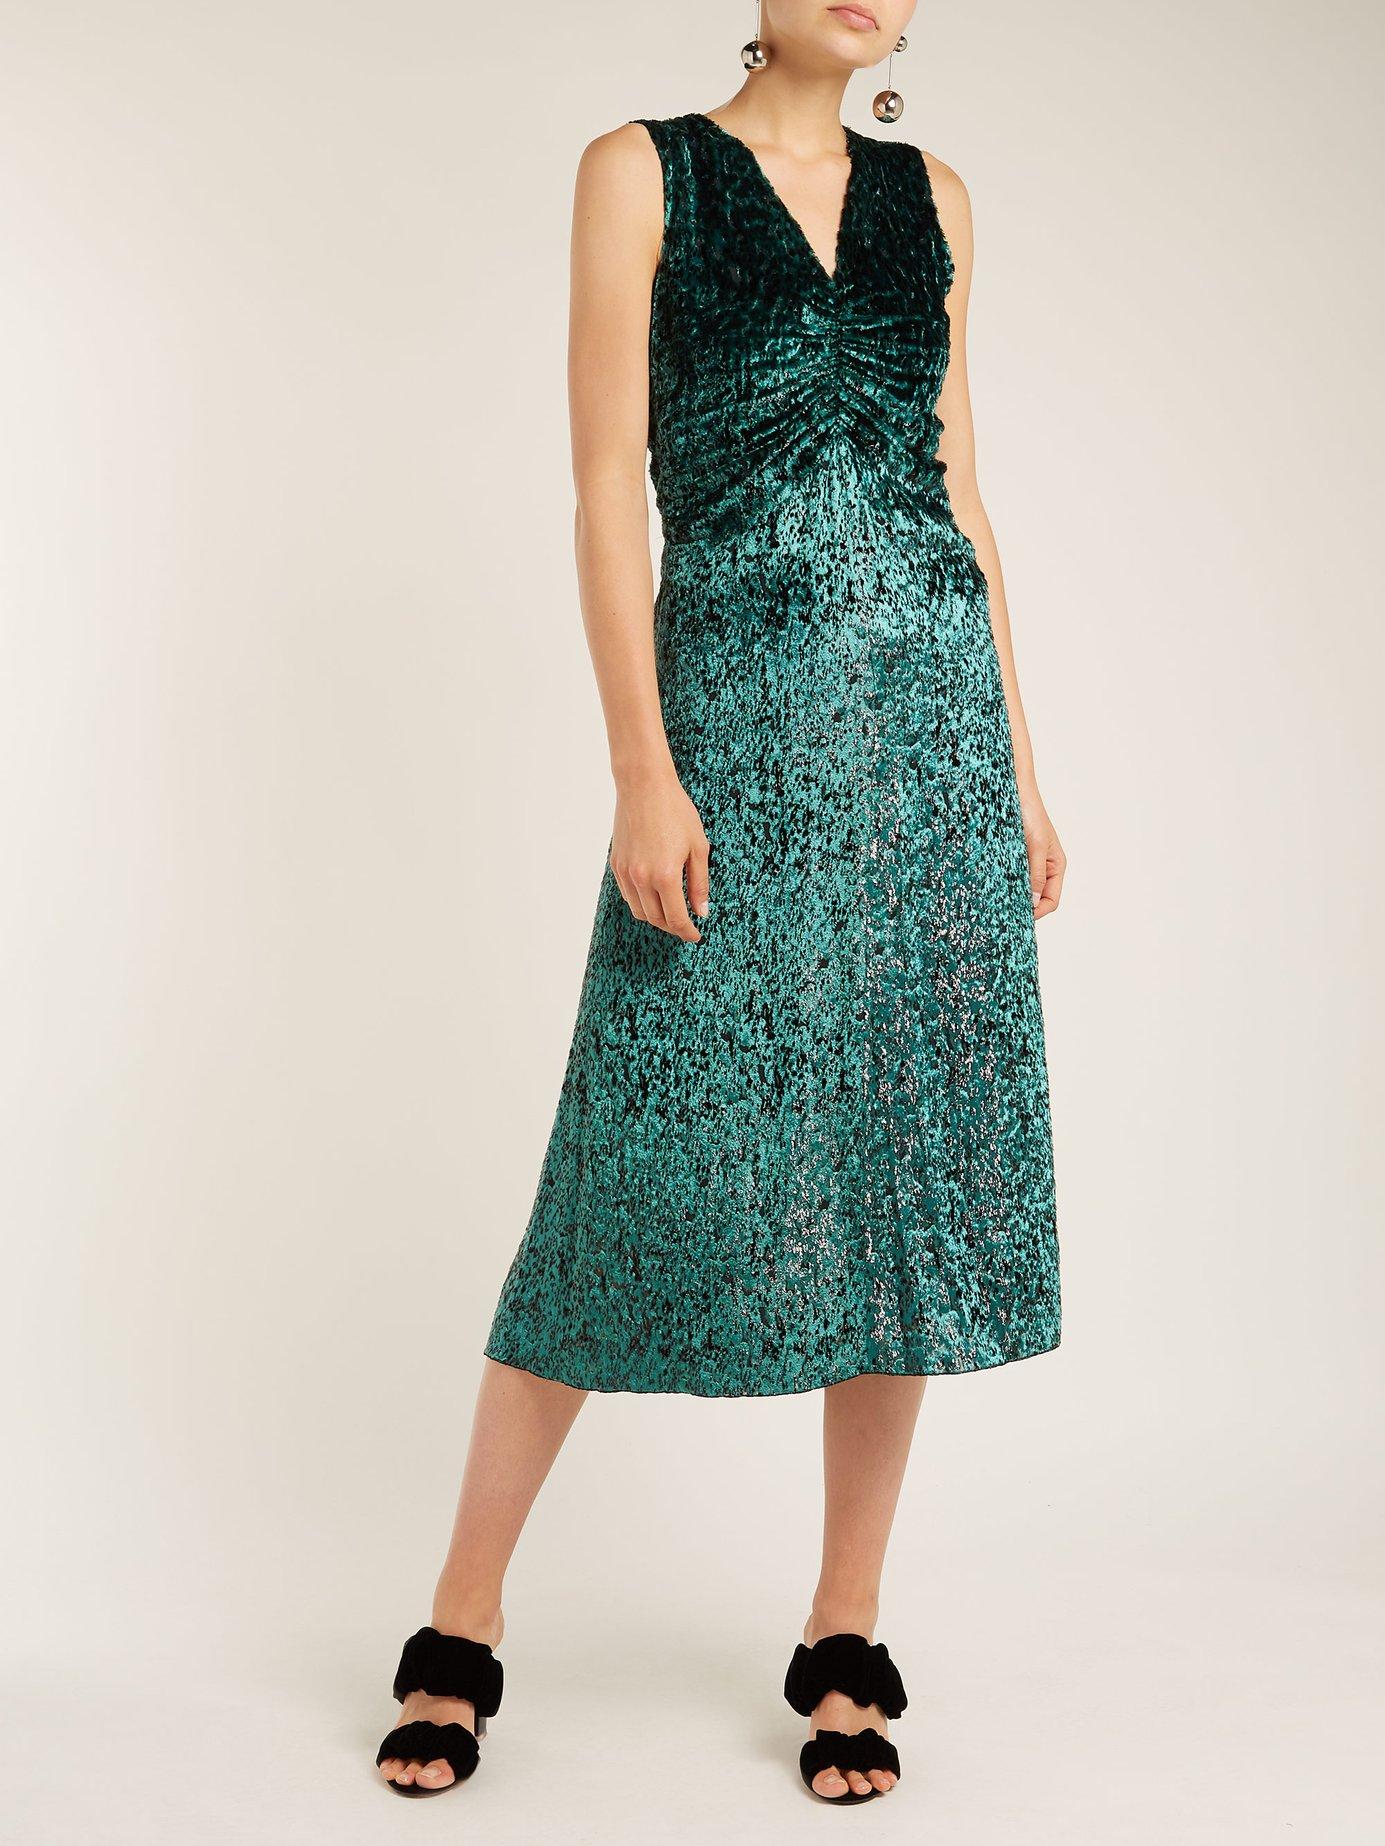 Laurent ruched velvet dress by Masscob